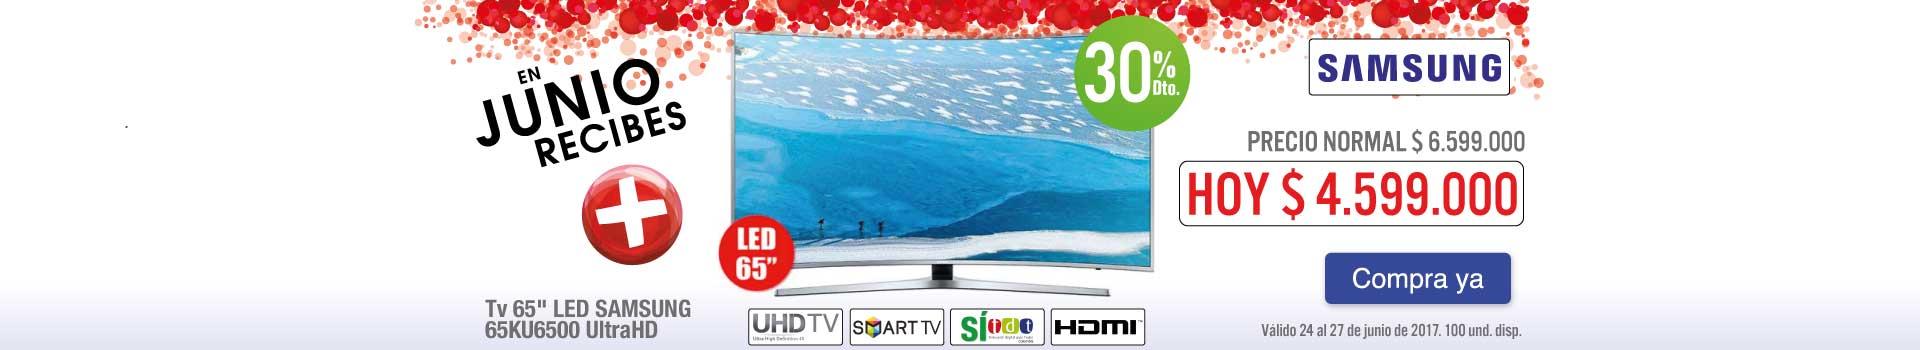 OPC KT- TV SG 65KU65 - JUNIO 24